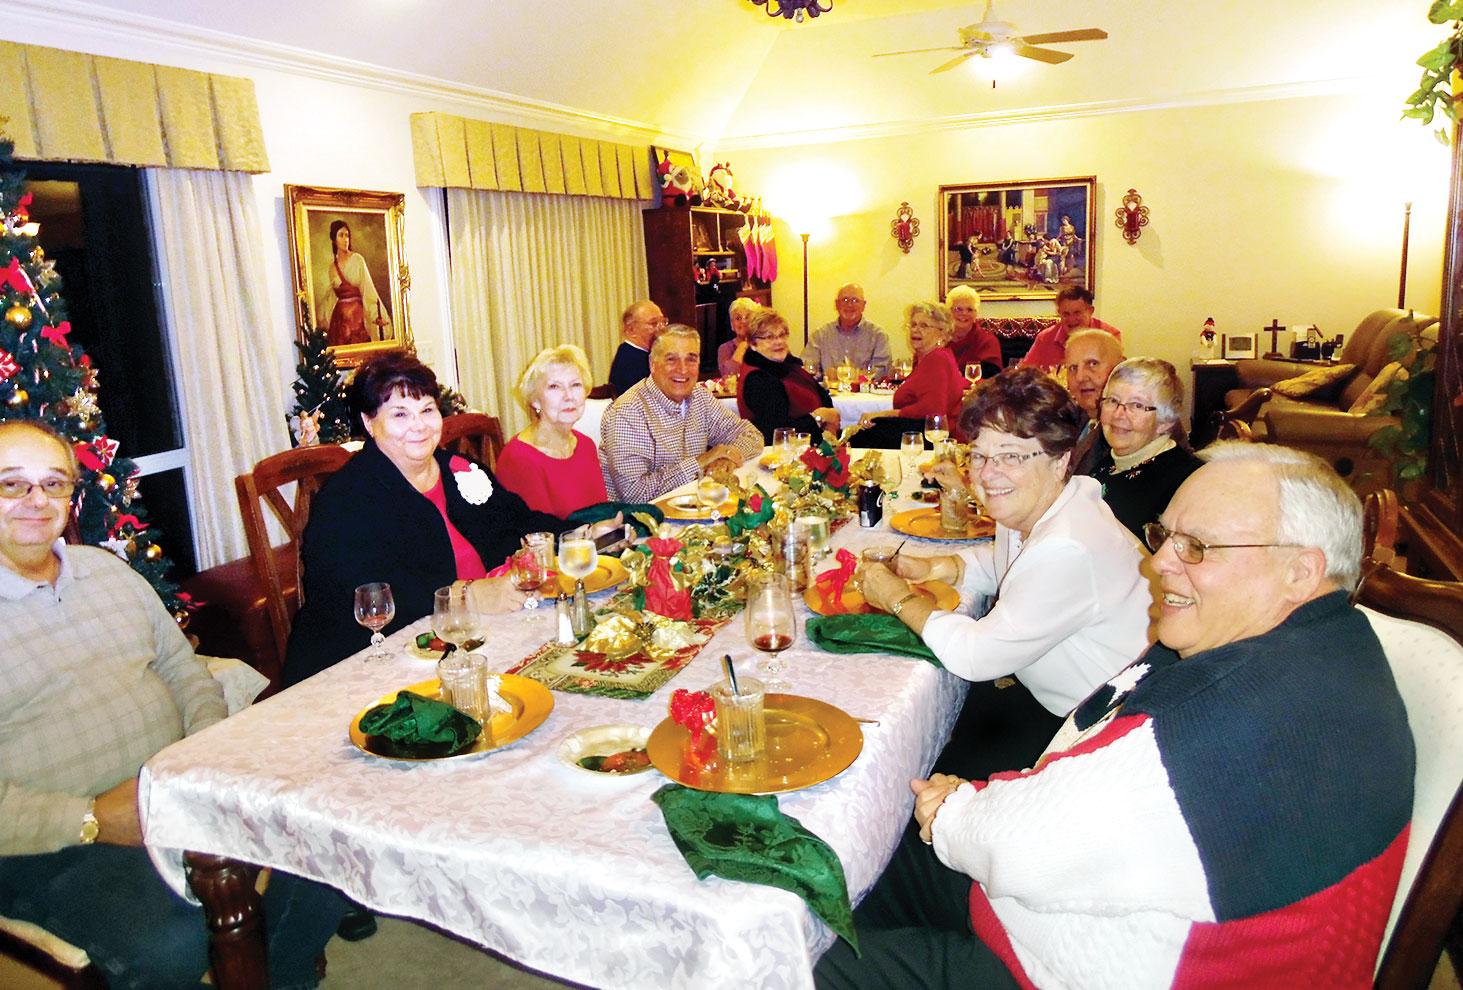 Kiwanis Club sharing a season of love and laughter